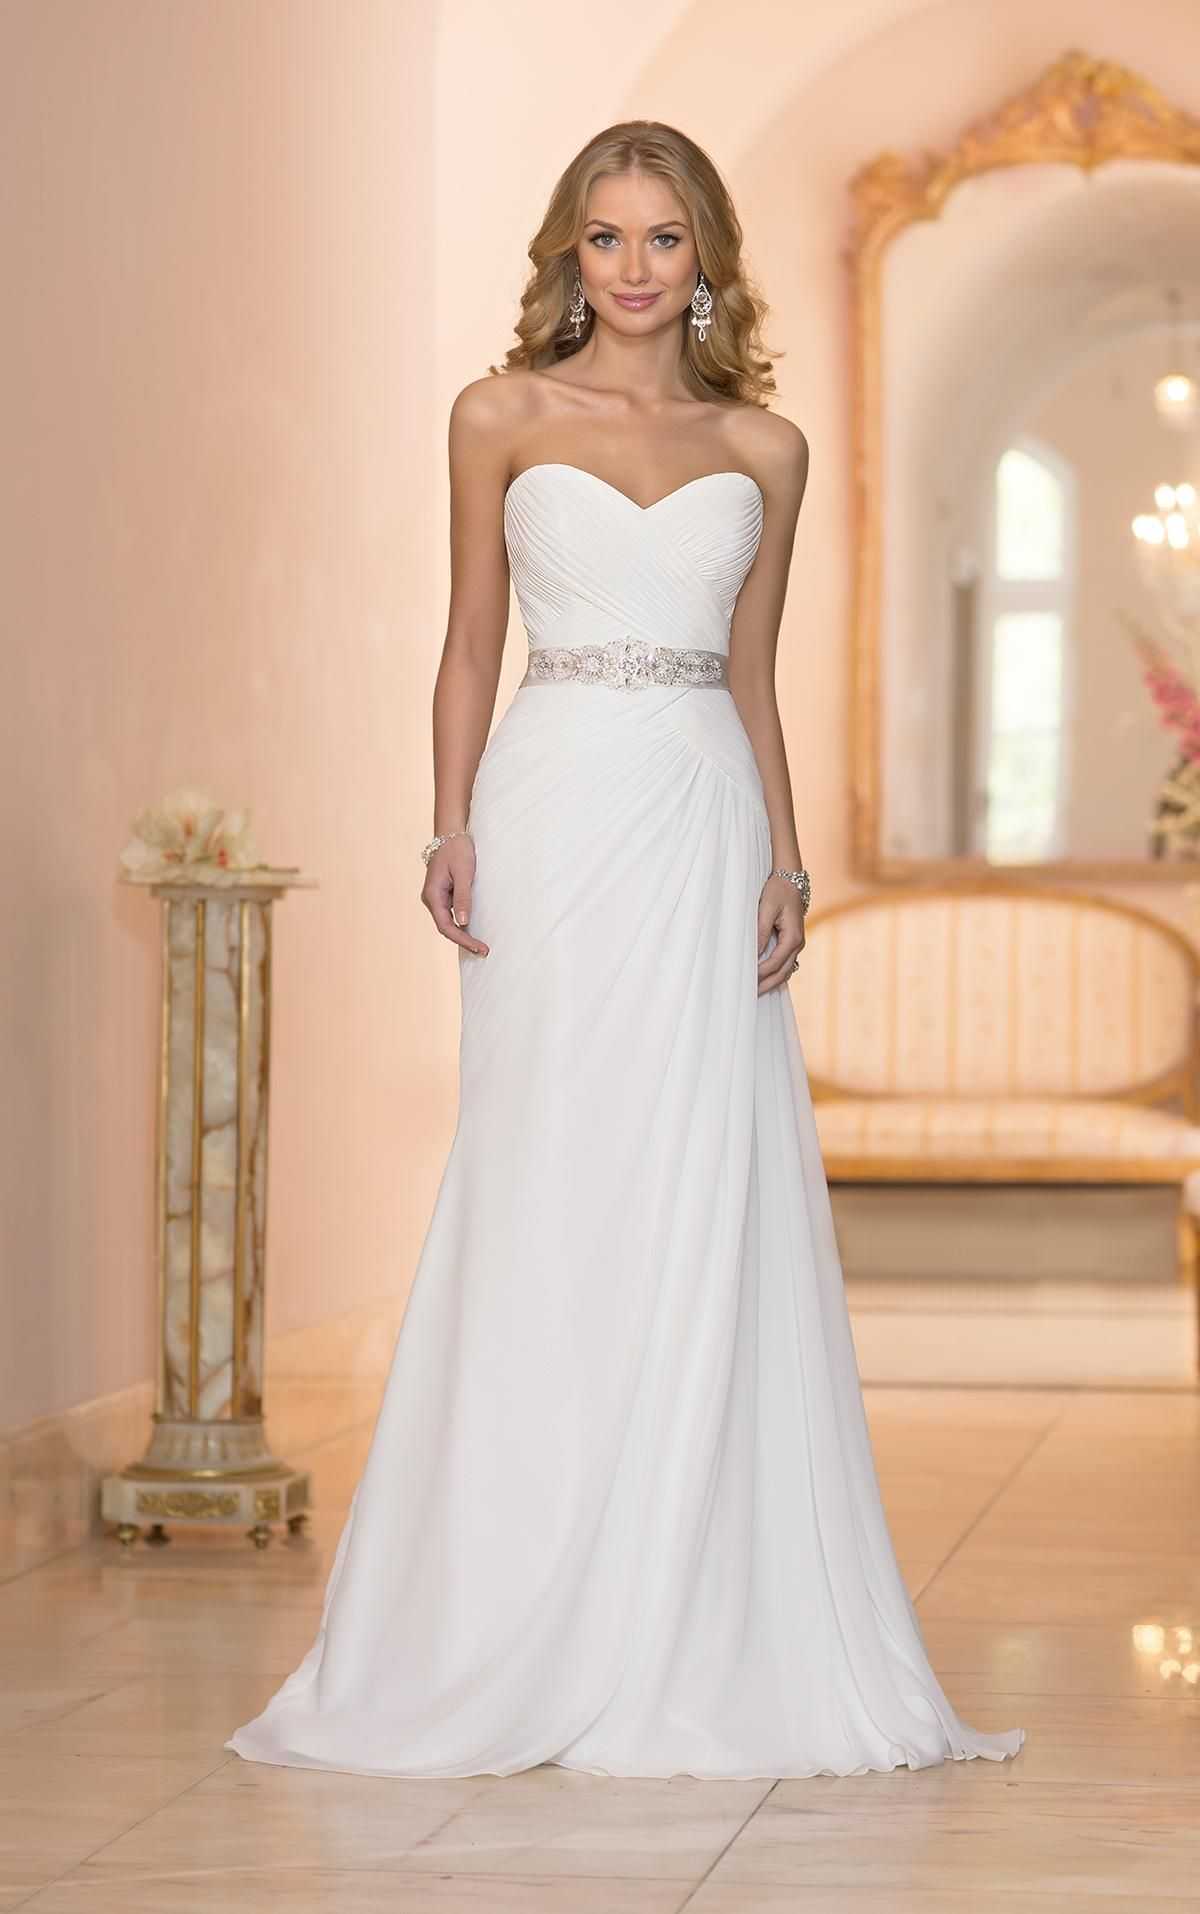 Fitted Sheath Wedding Dress 2016 Chiffon Sheath Wedding Dresses By Stella  York Sweetheart Neck Pleated Chiffon Fit And Flare Bridal Gowns For Beach  Weddings ... 5985d0e2e935